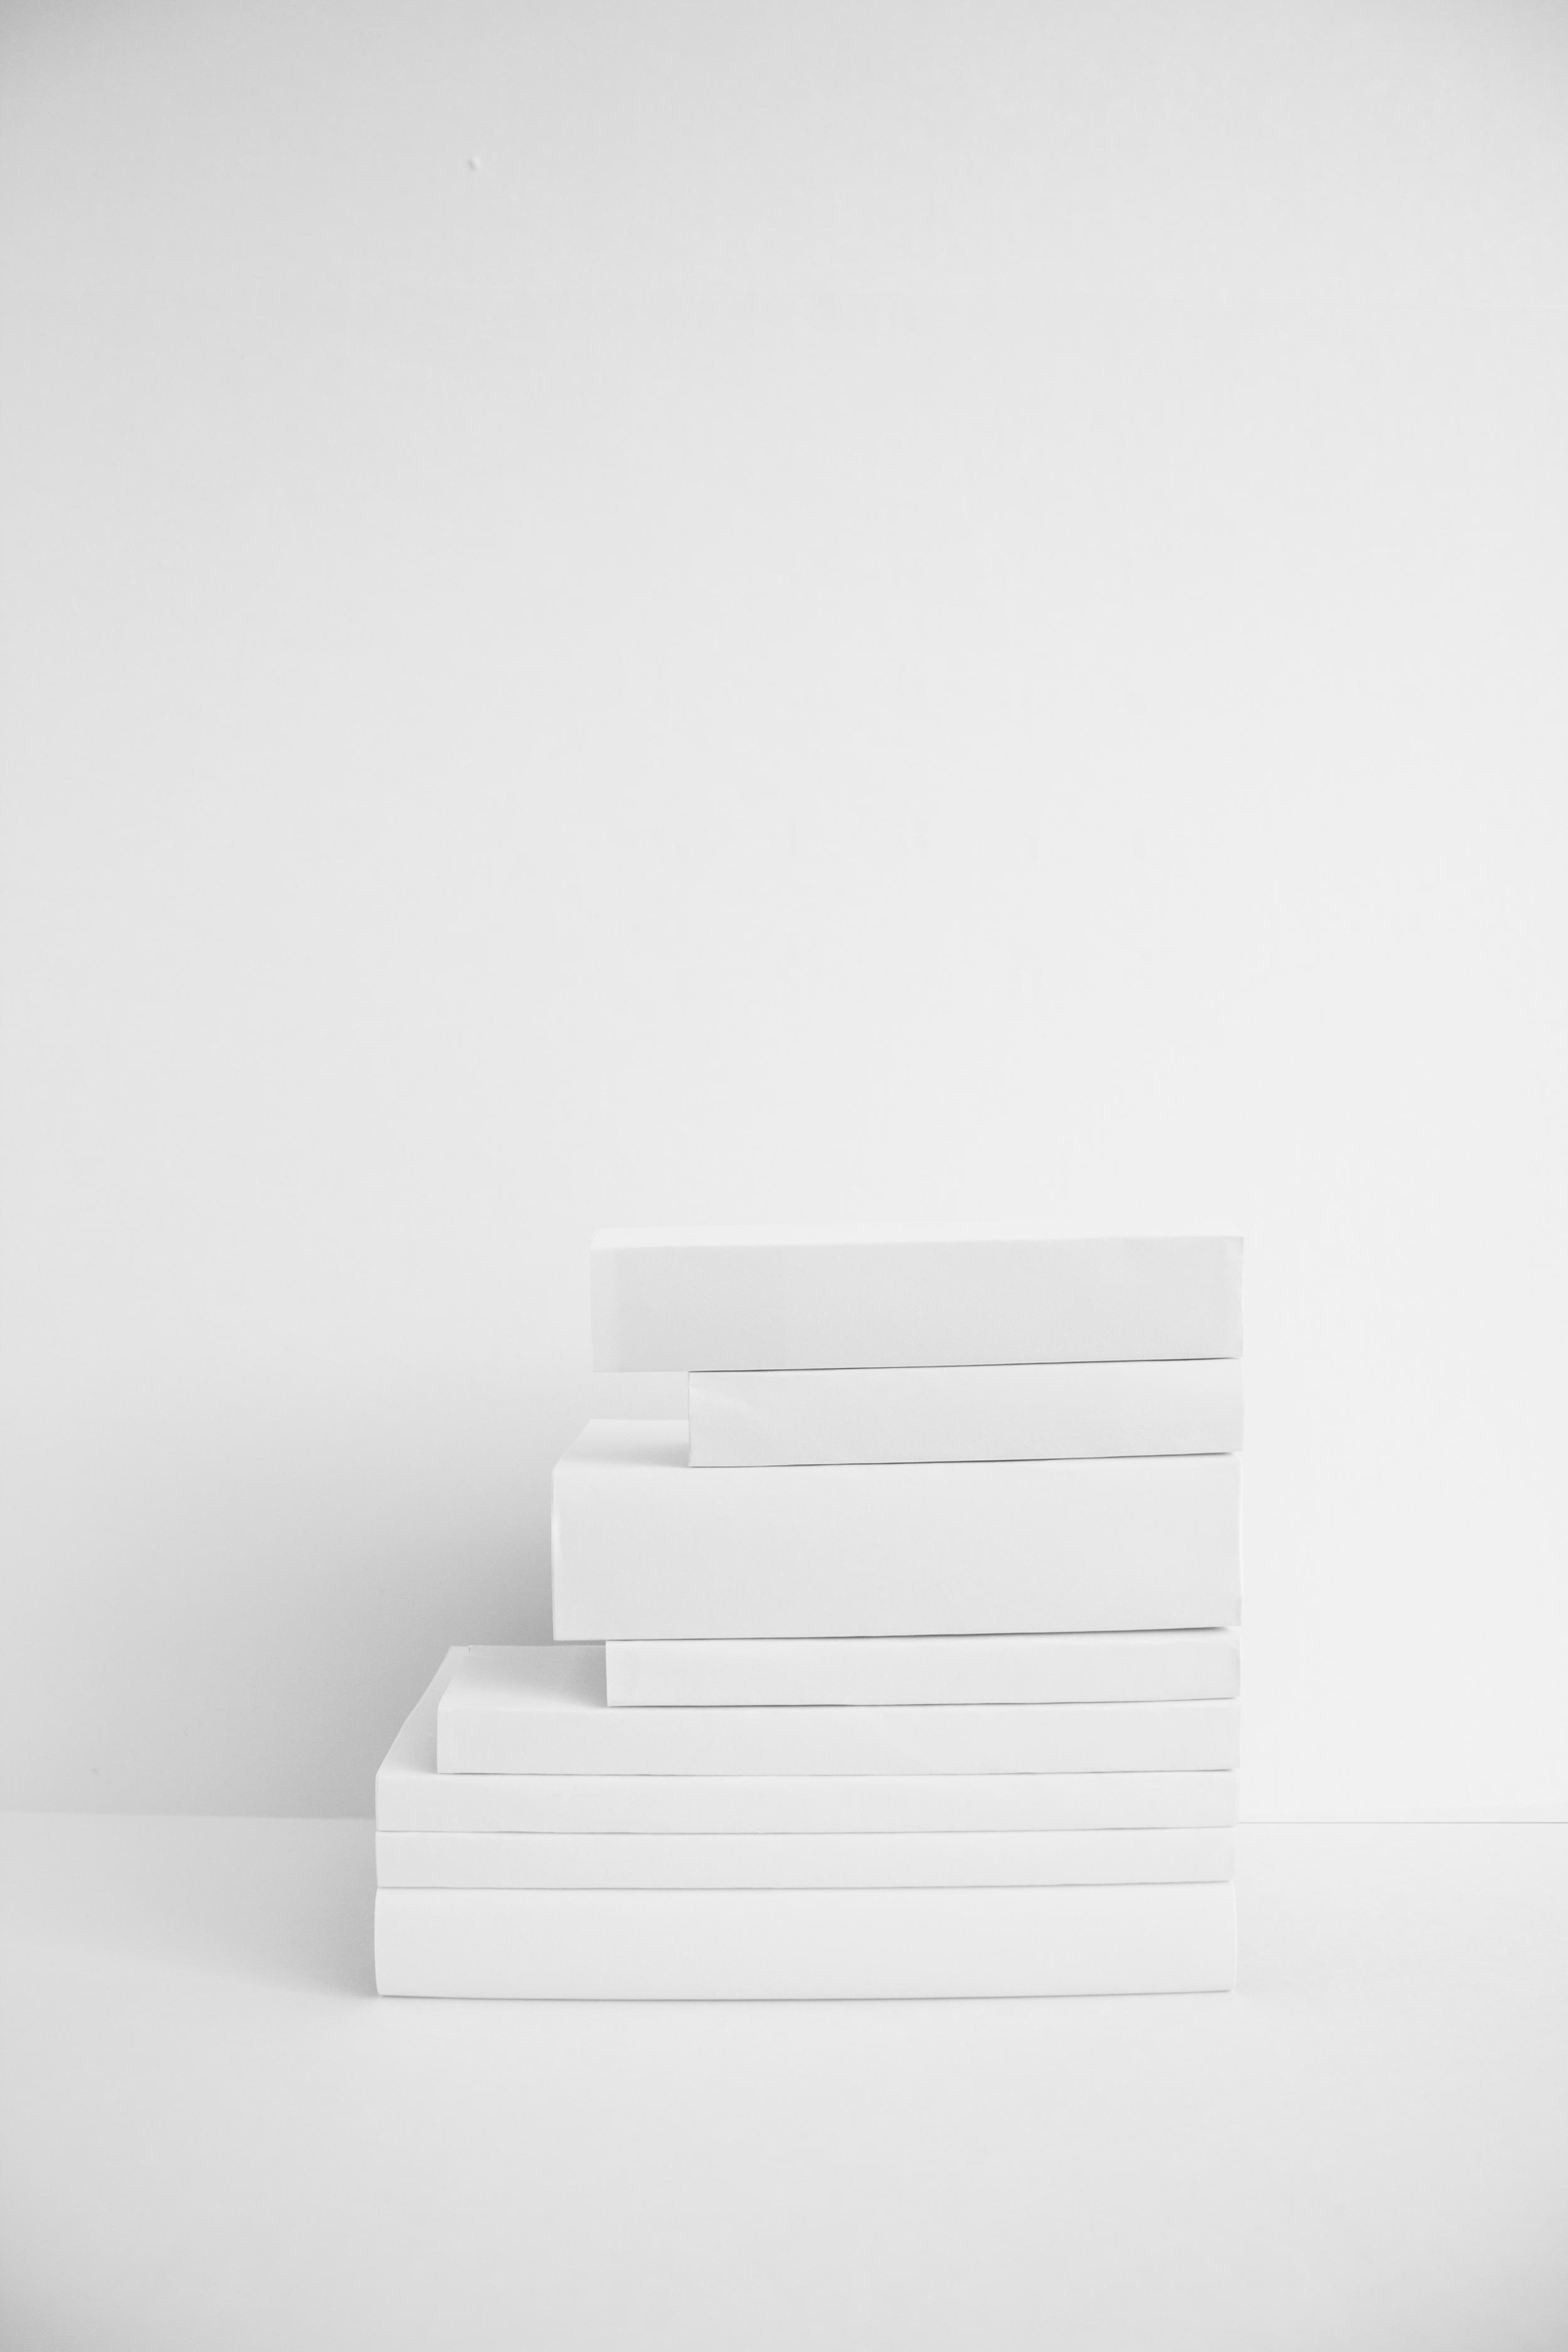 Mandopops, MFA thesis _ Identity, Branding, Printing & UI/UX